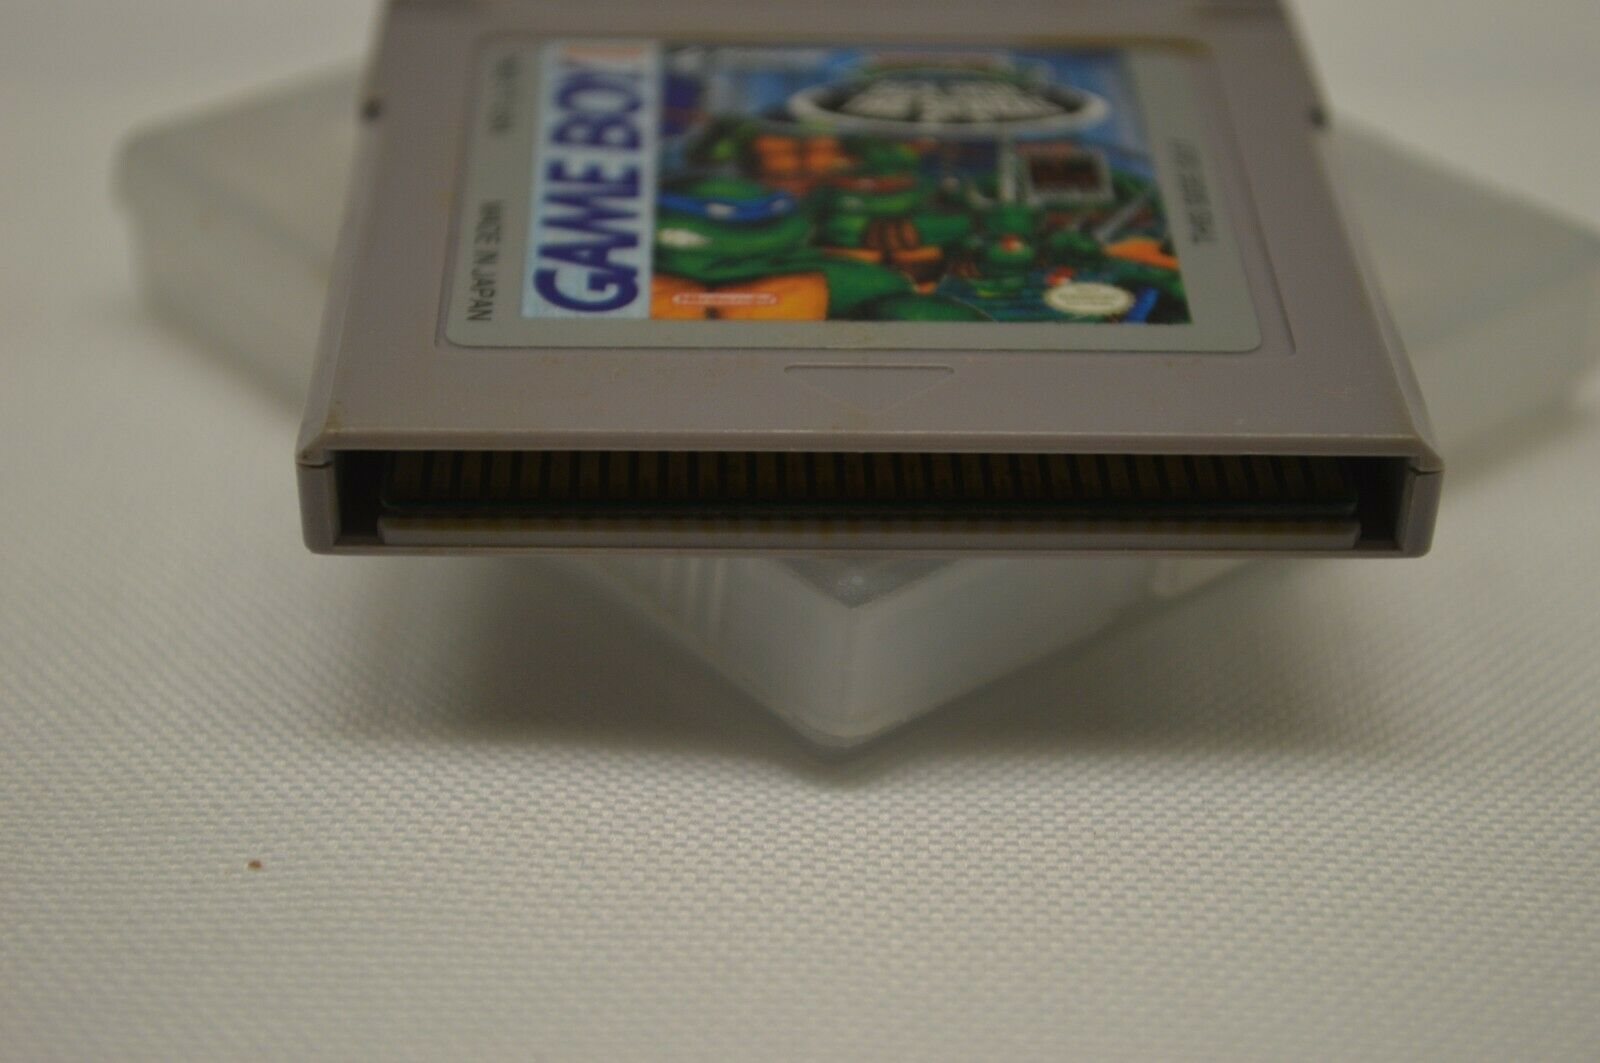 Teenage Mutant Ninja Turtles II: Back From The Sewers (Nintendo Game Boy, 1991) image 2